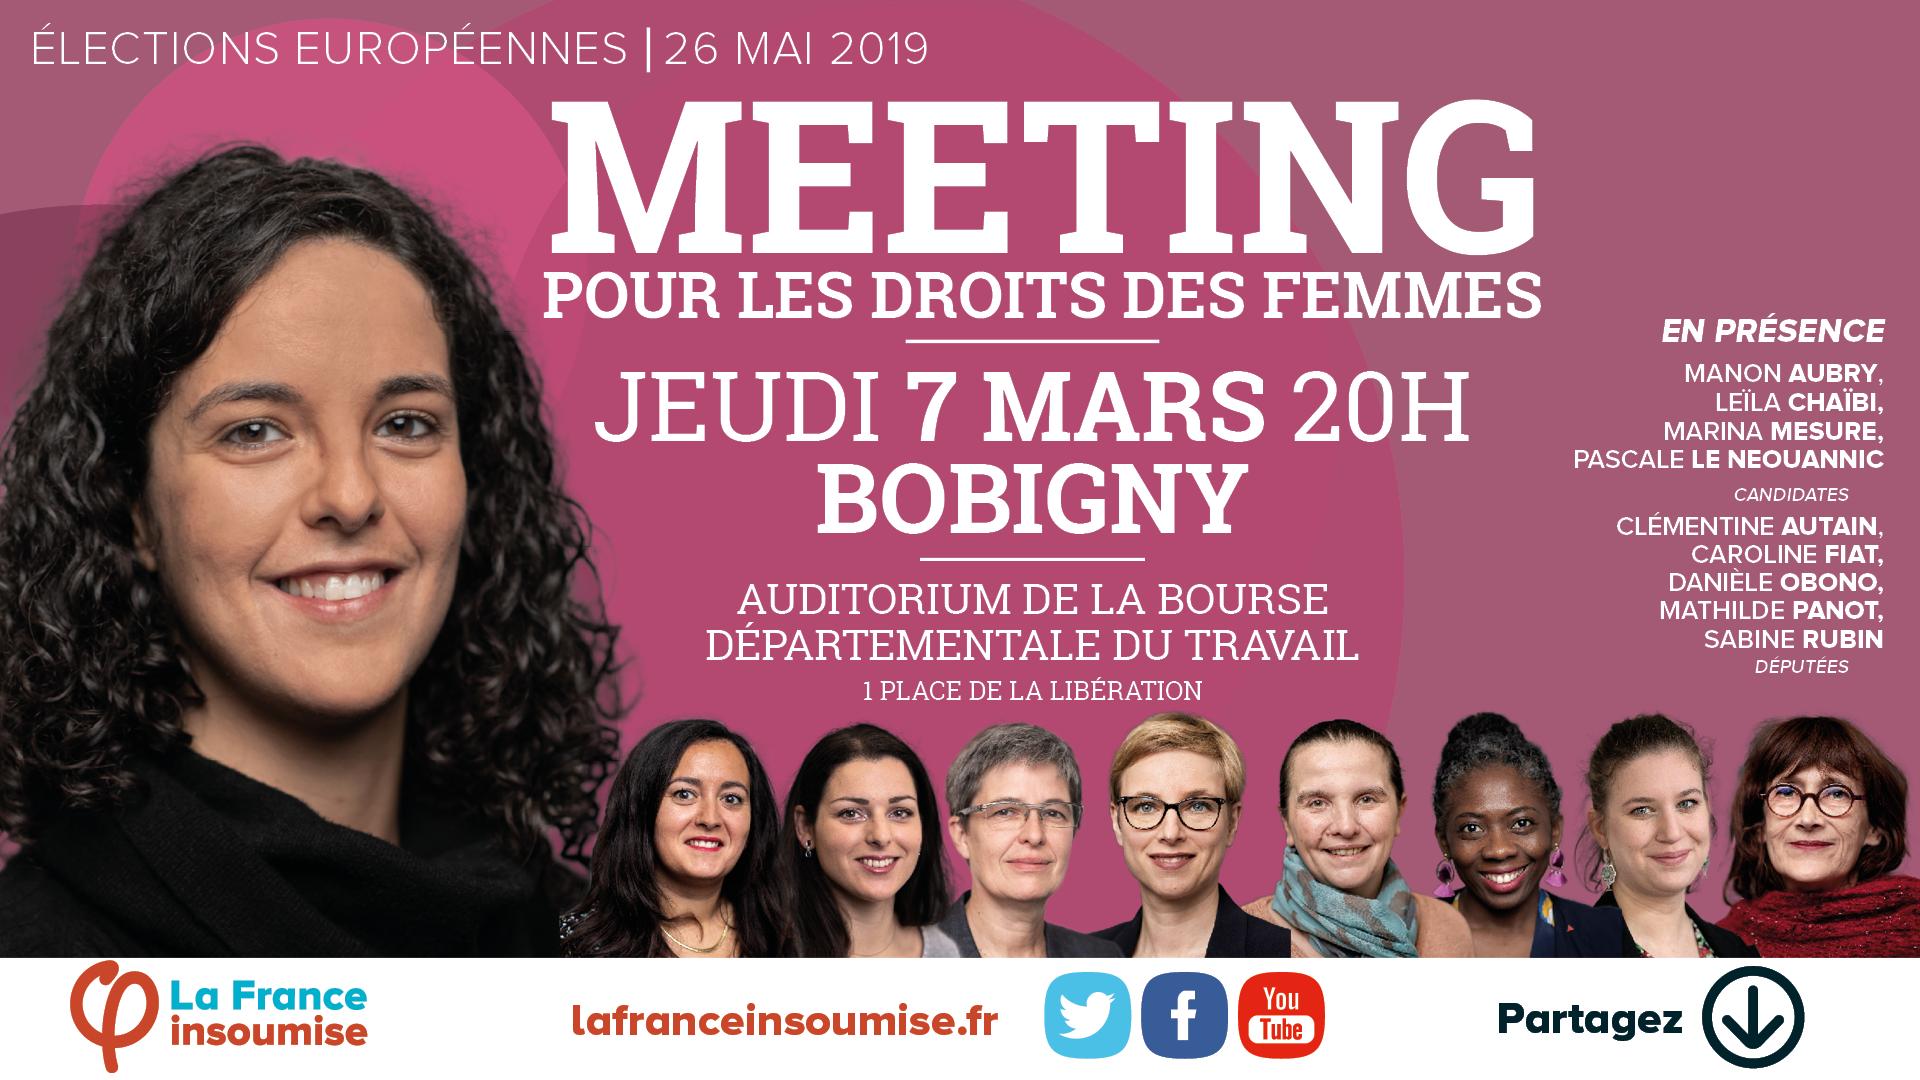 Meeting Bobigny